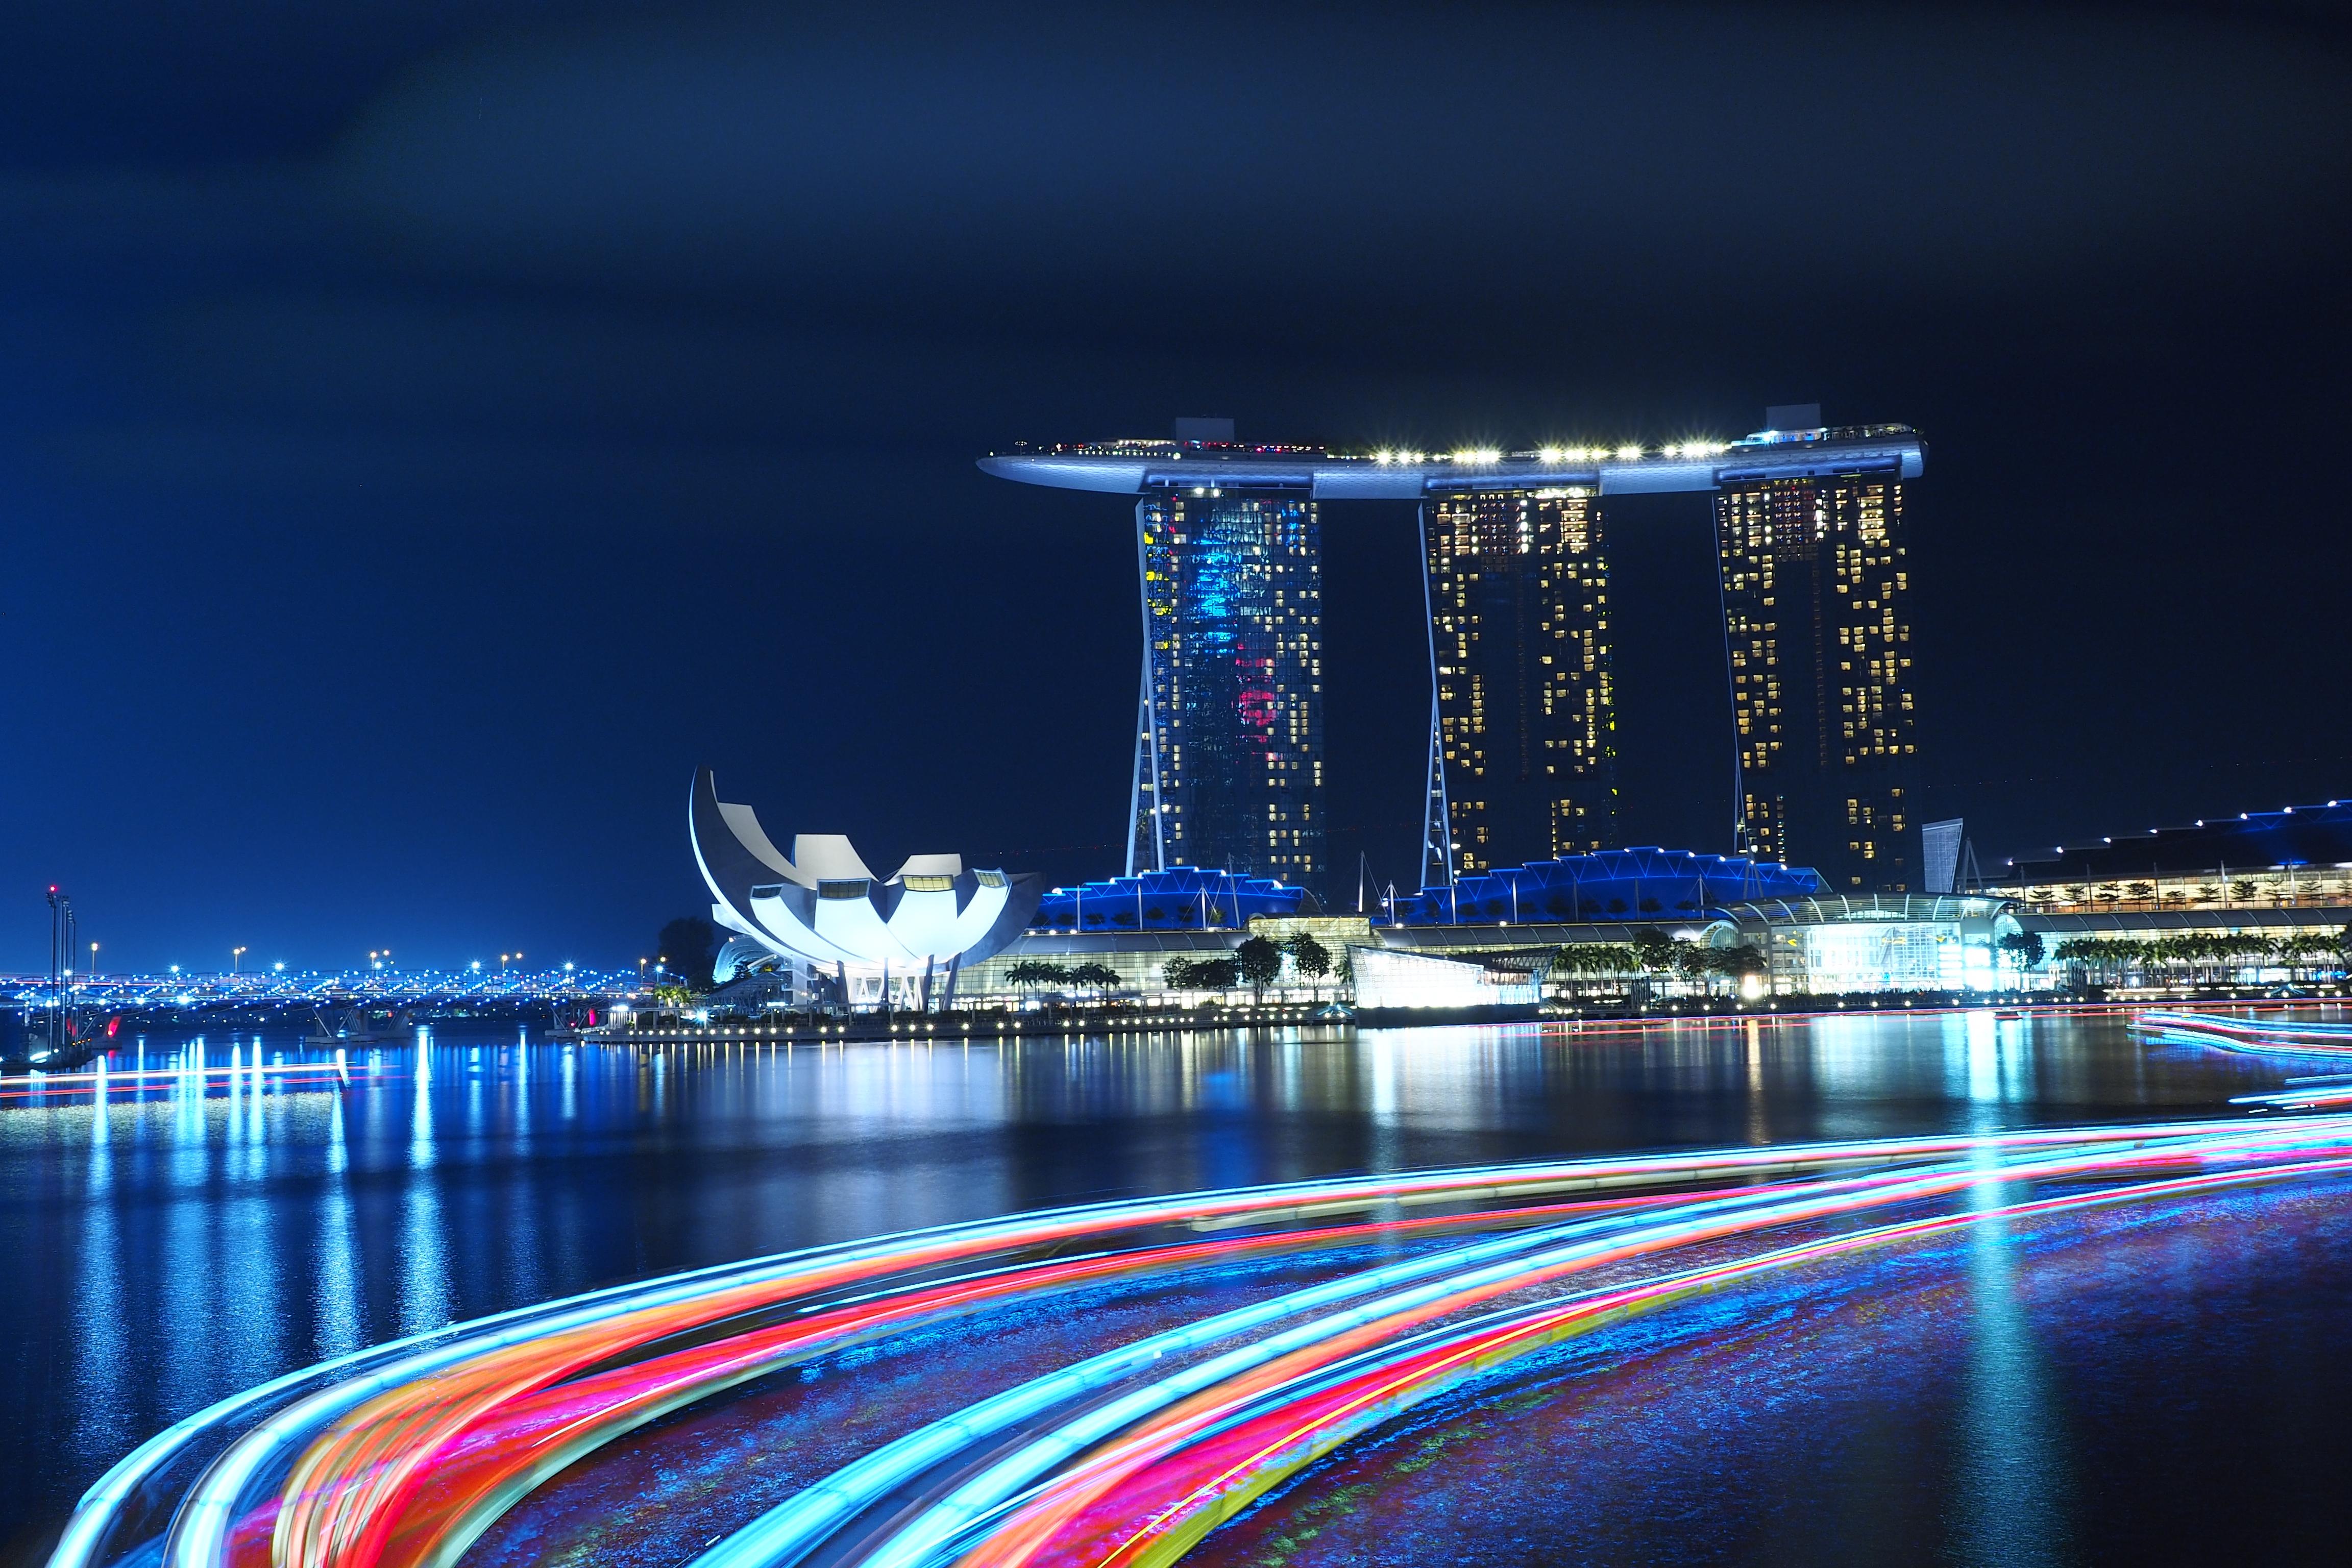 Free Images : Horizon, Light, Structure, Skyline, Night